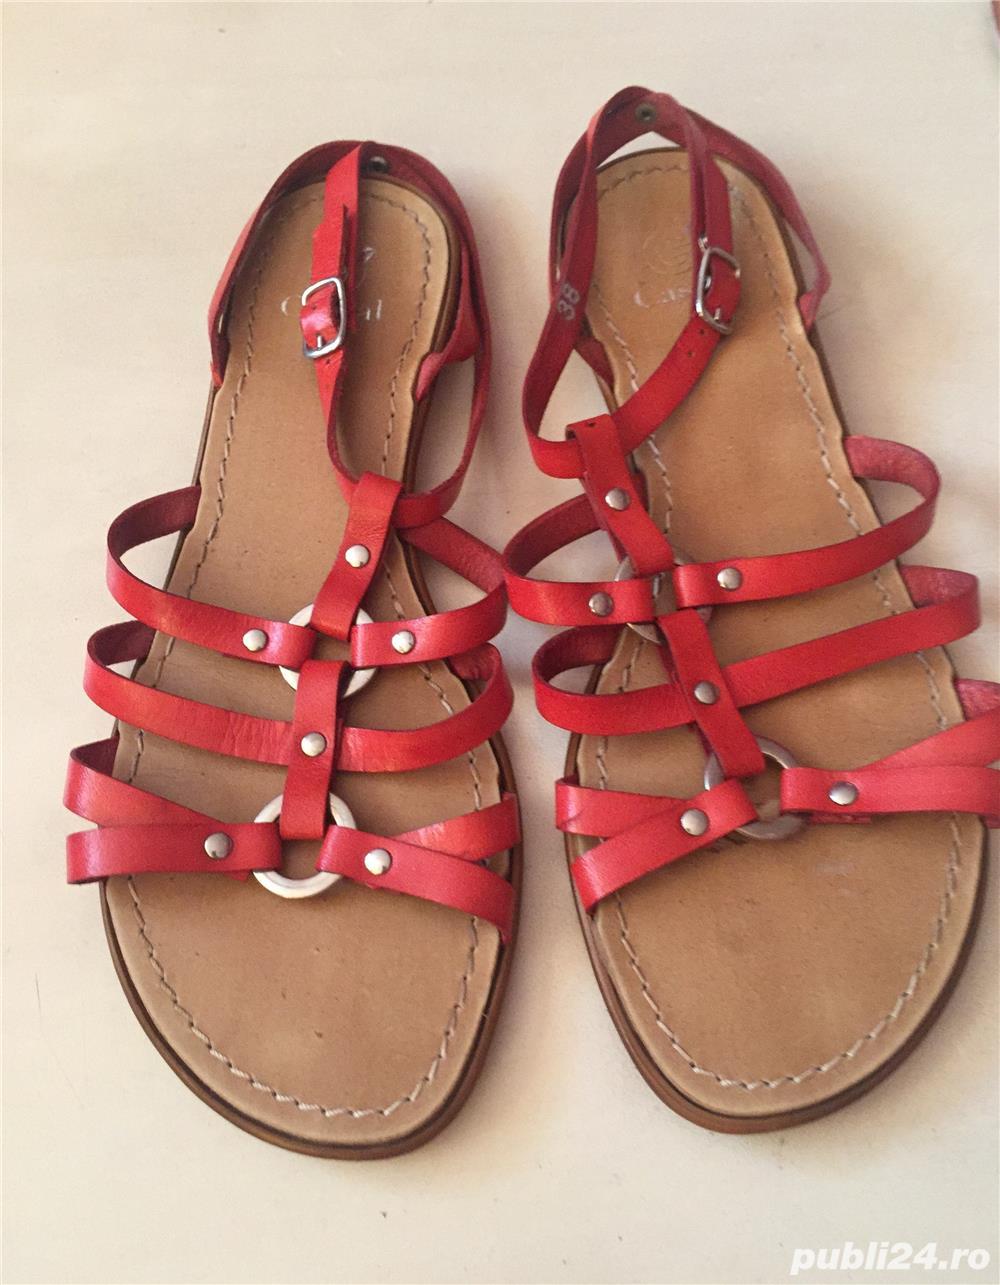 Sandale italienesti din piele